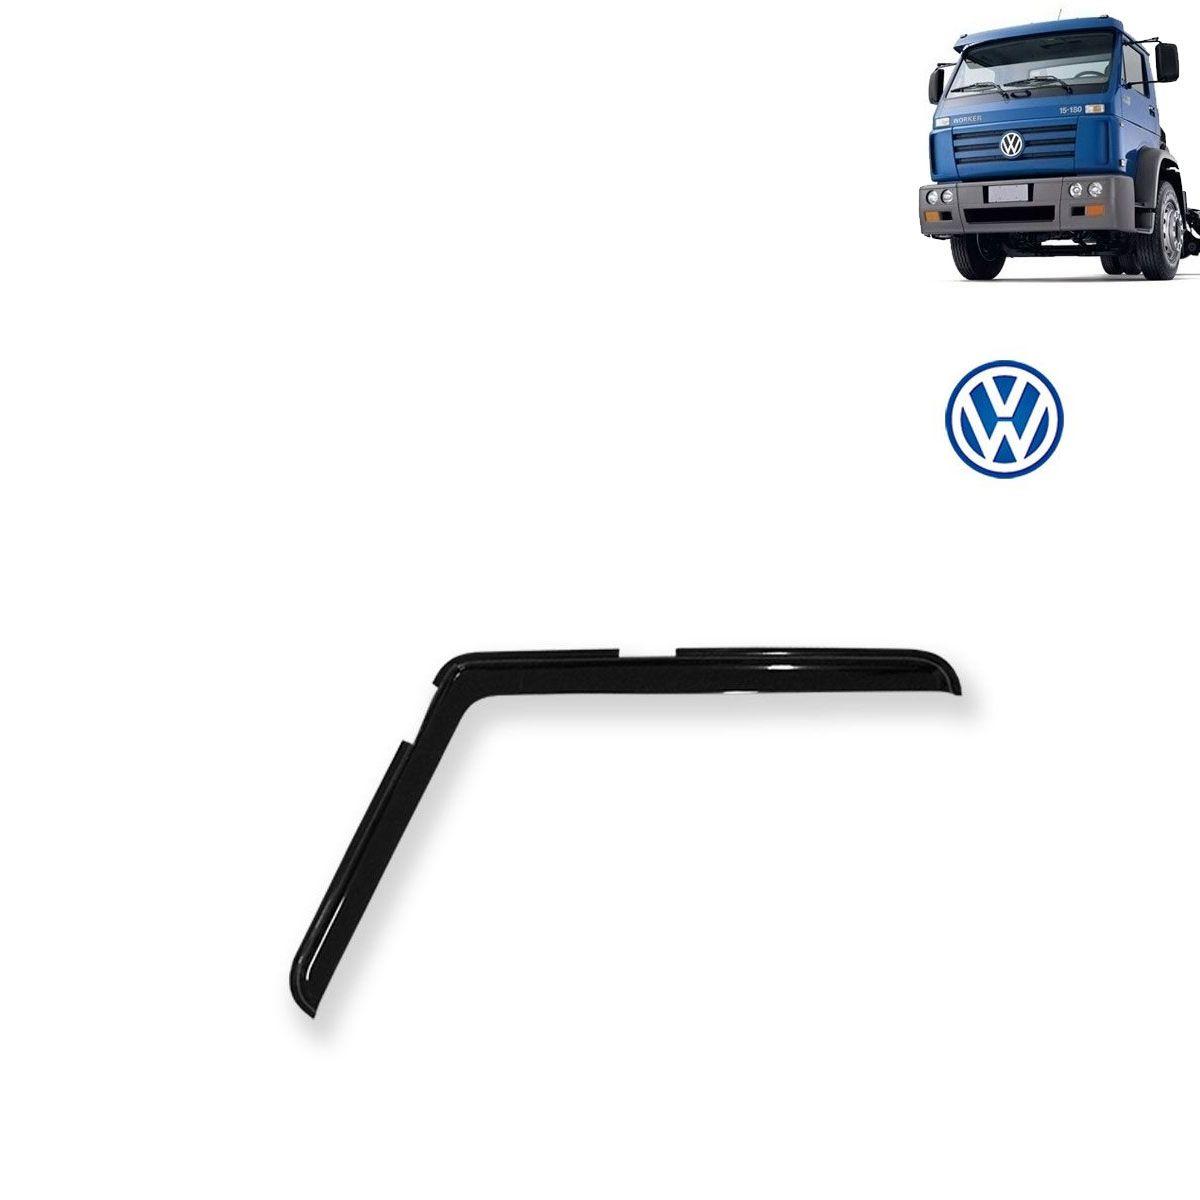 Calha de Chuva Porta para Caminhão Volkswagem Titan Tractor - Delivery Adesiva